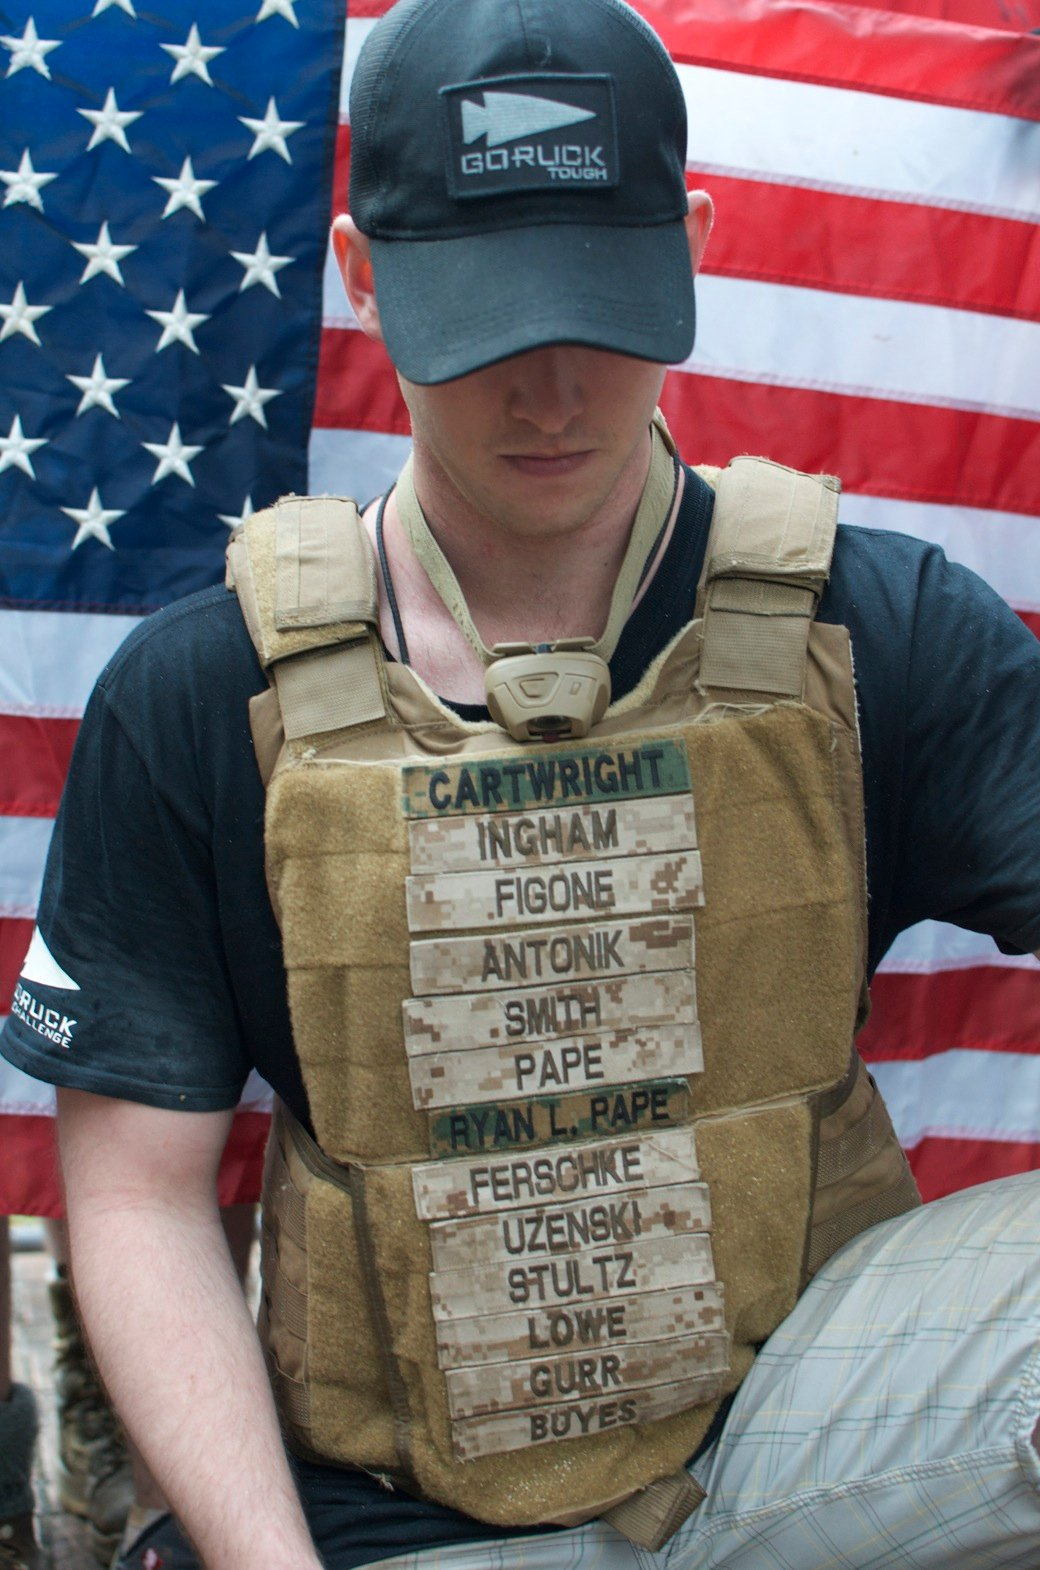 GORUCK Team Weight_Fallen Marines